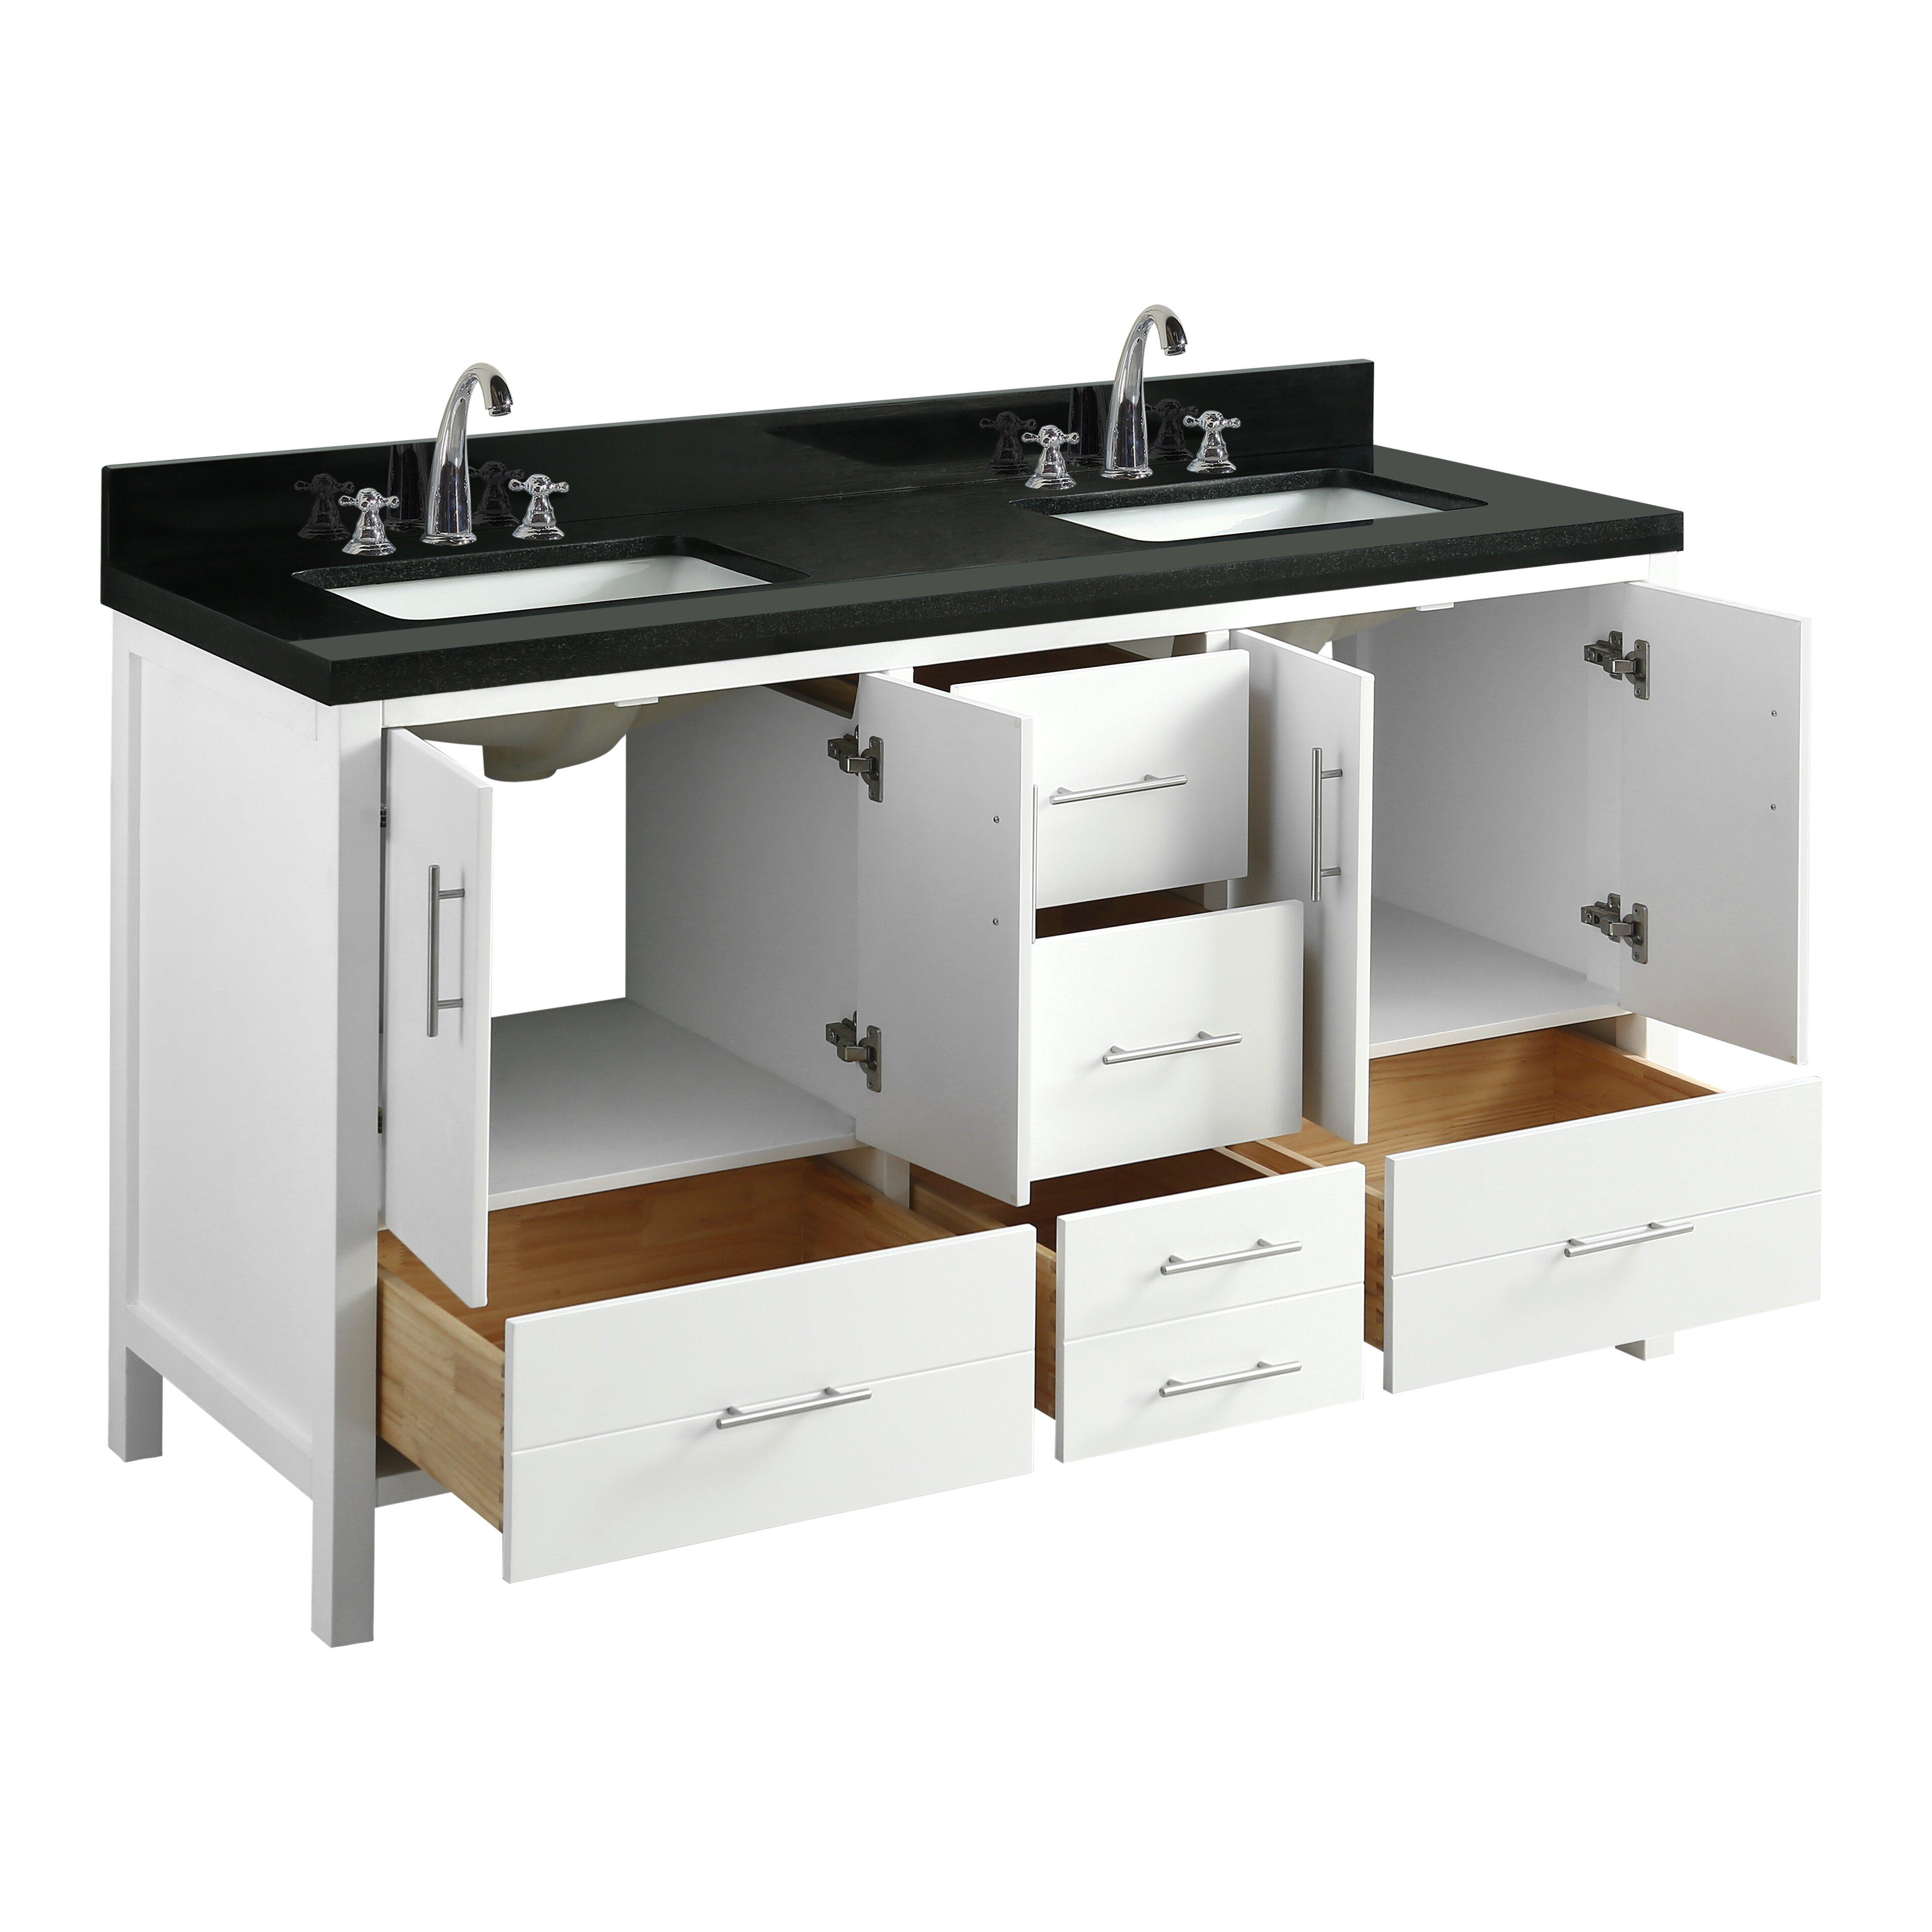 brown single home kitchen cutler vanity size design inch outlet shop bath amazon floating bathroom vanities wood center